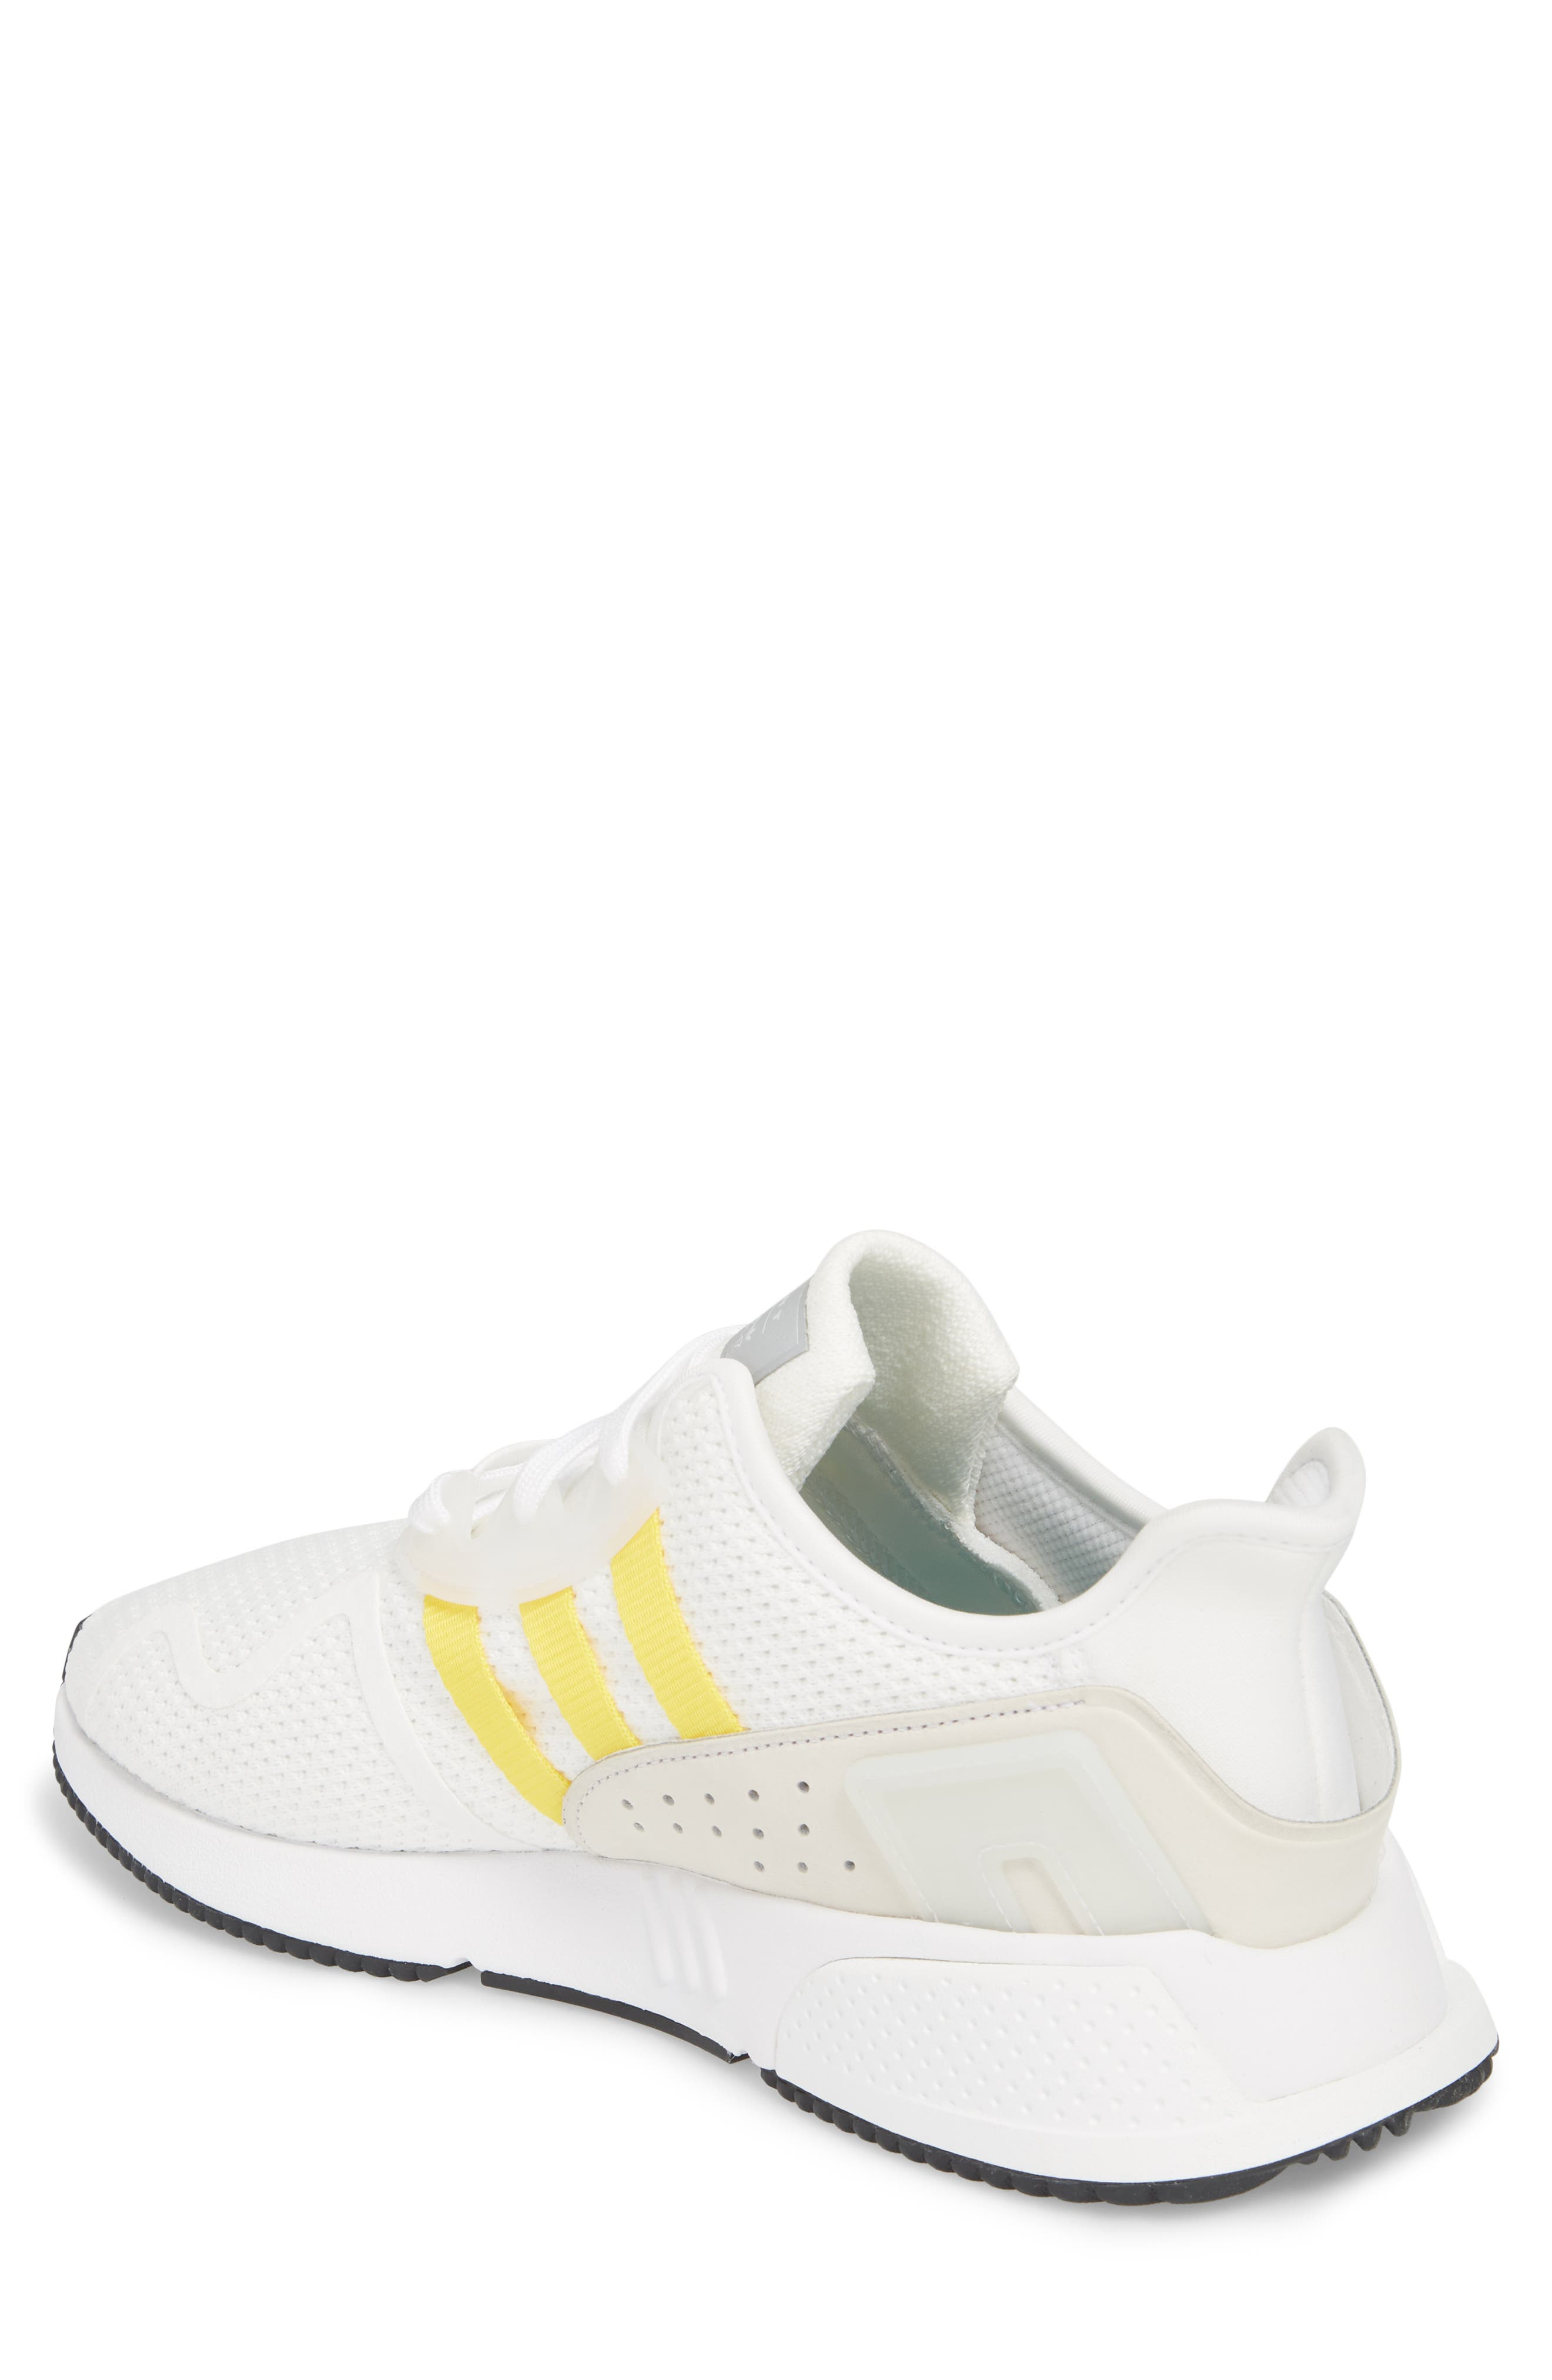 EQT Cushion ADV Sneaker,                             Alternate thumbnail 2, color,                             WHITE/ SILVER